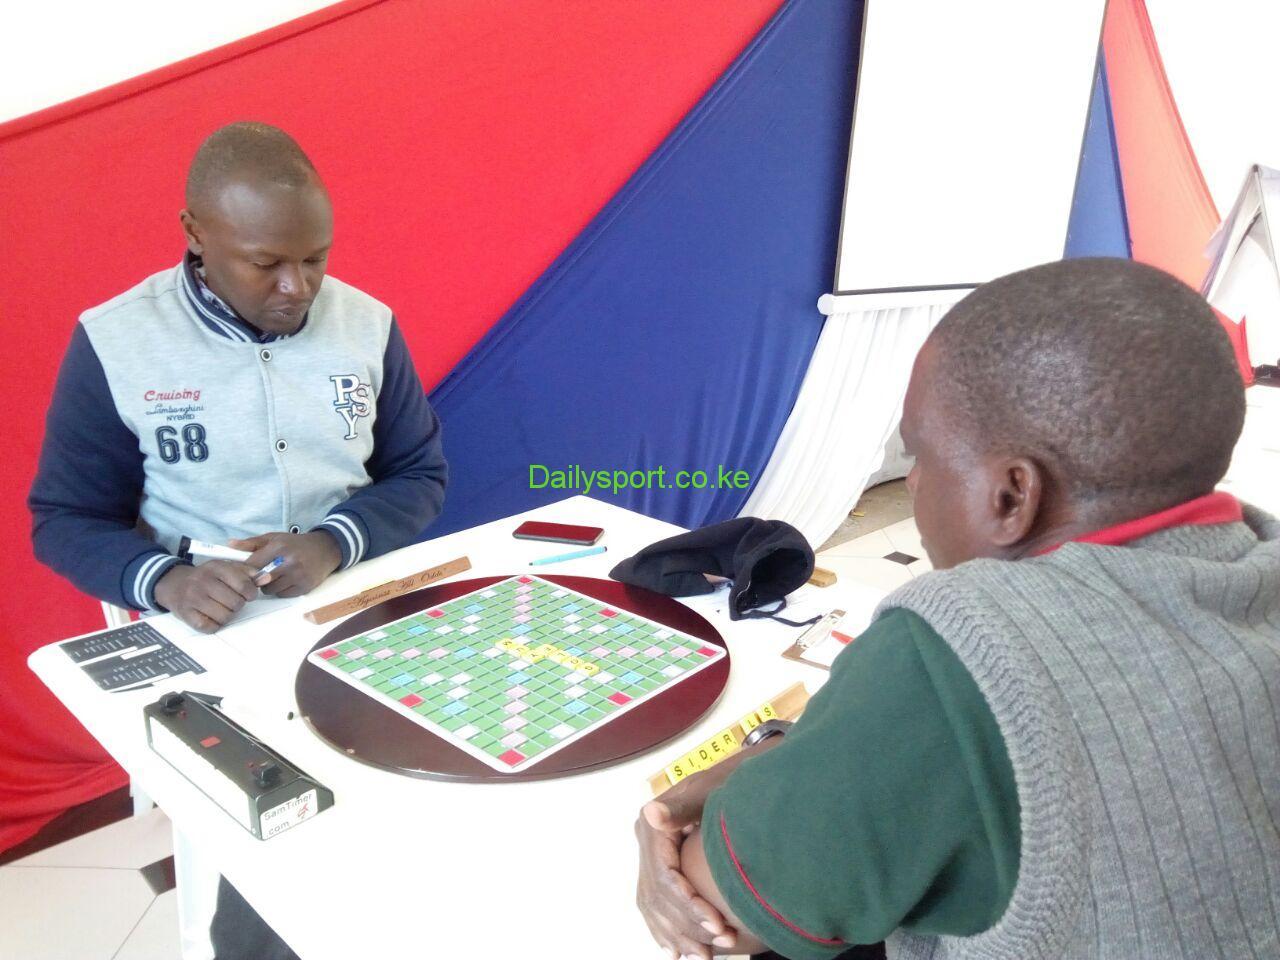 East Central Southern Africa Scrabble championships, Gitonga Nderitu, Muema Muumbi, Tom Mboya, Kipruto Tarus, Hillary Bushienei,